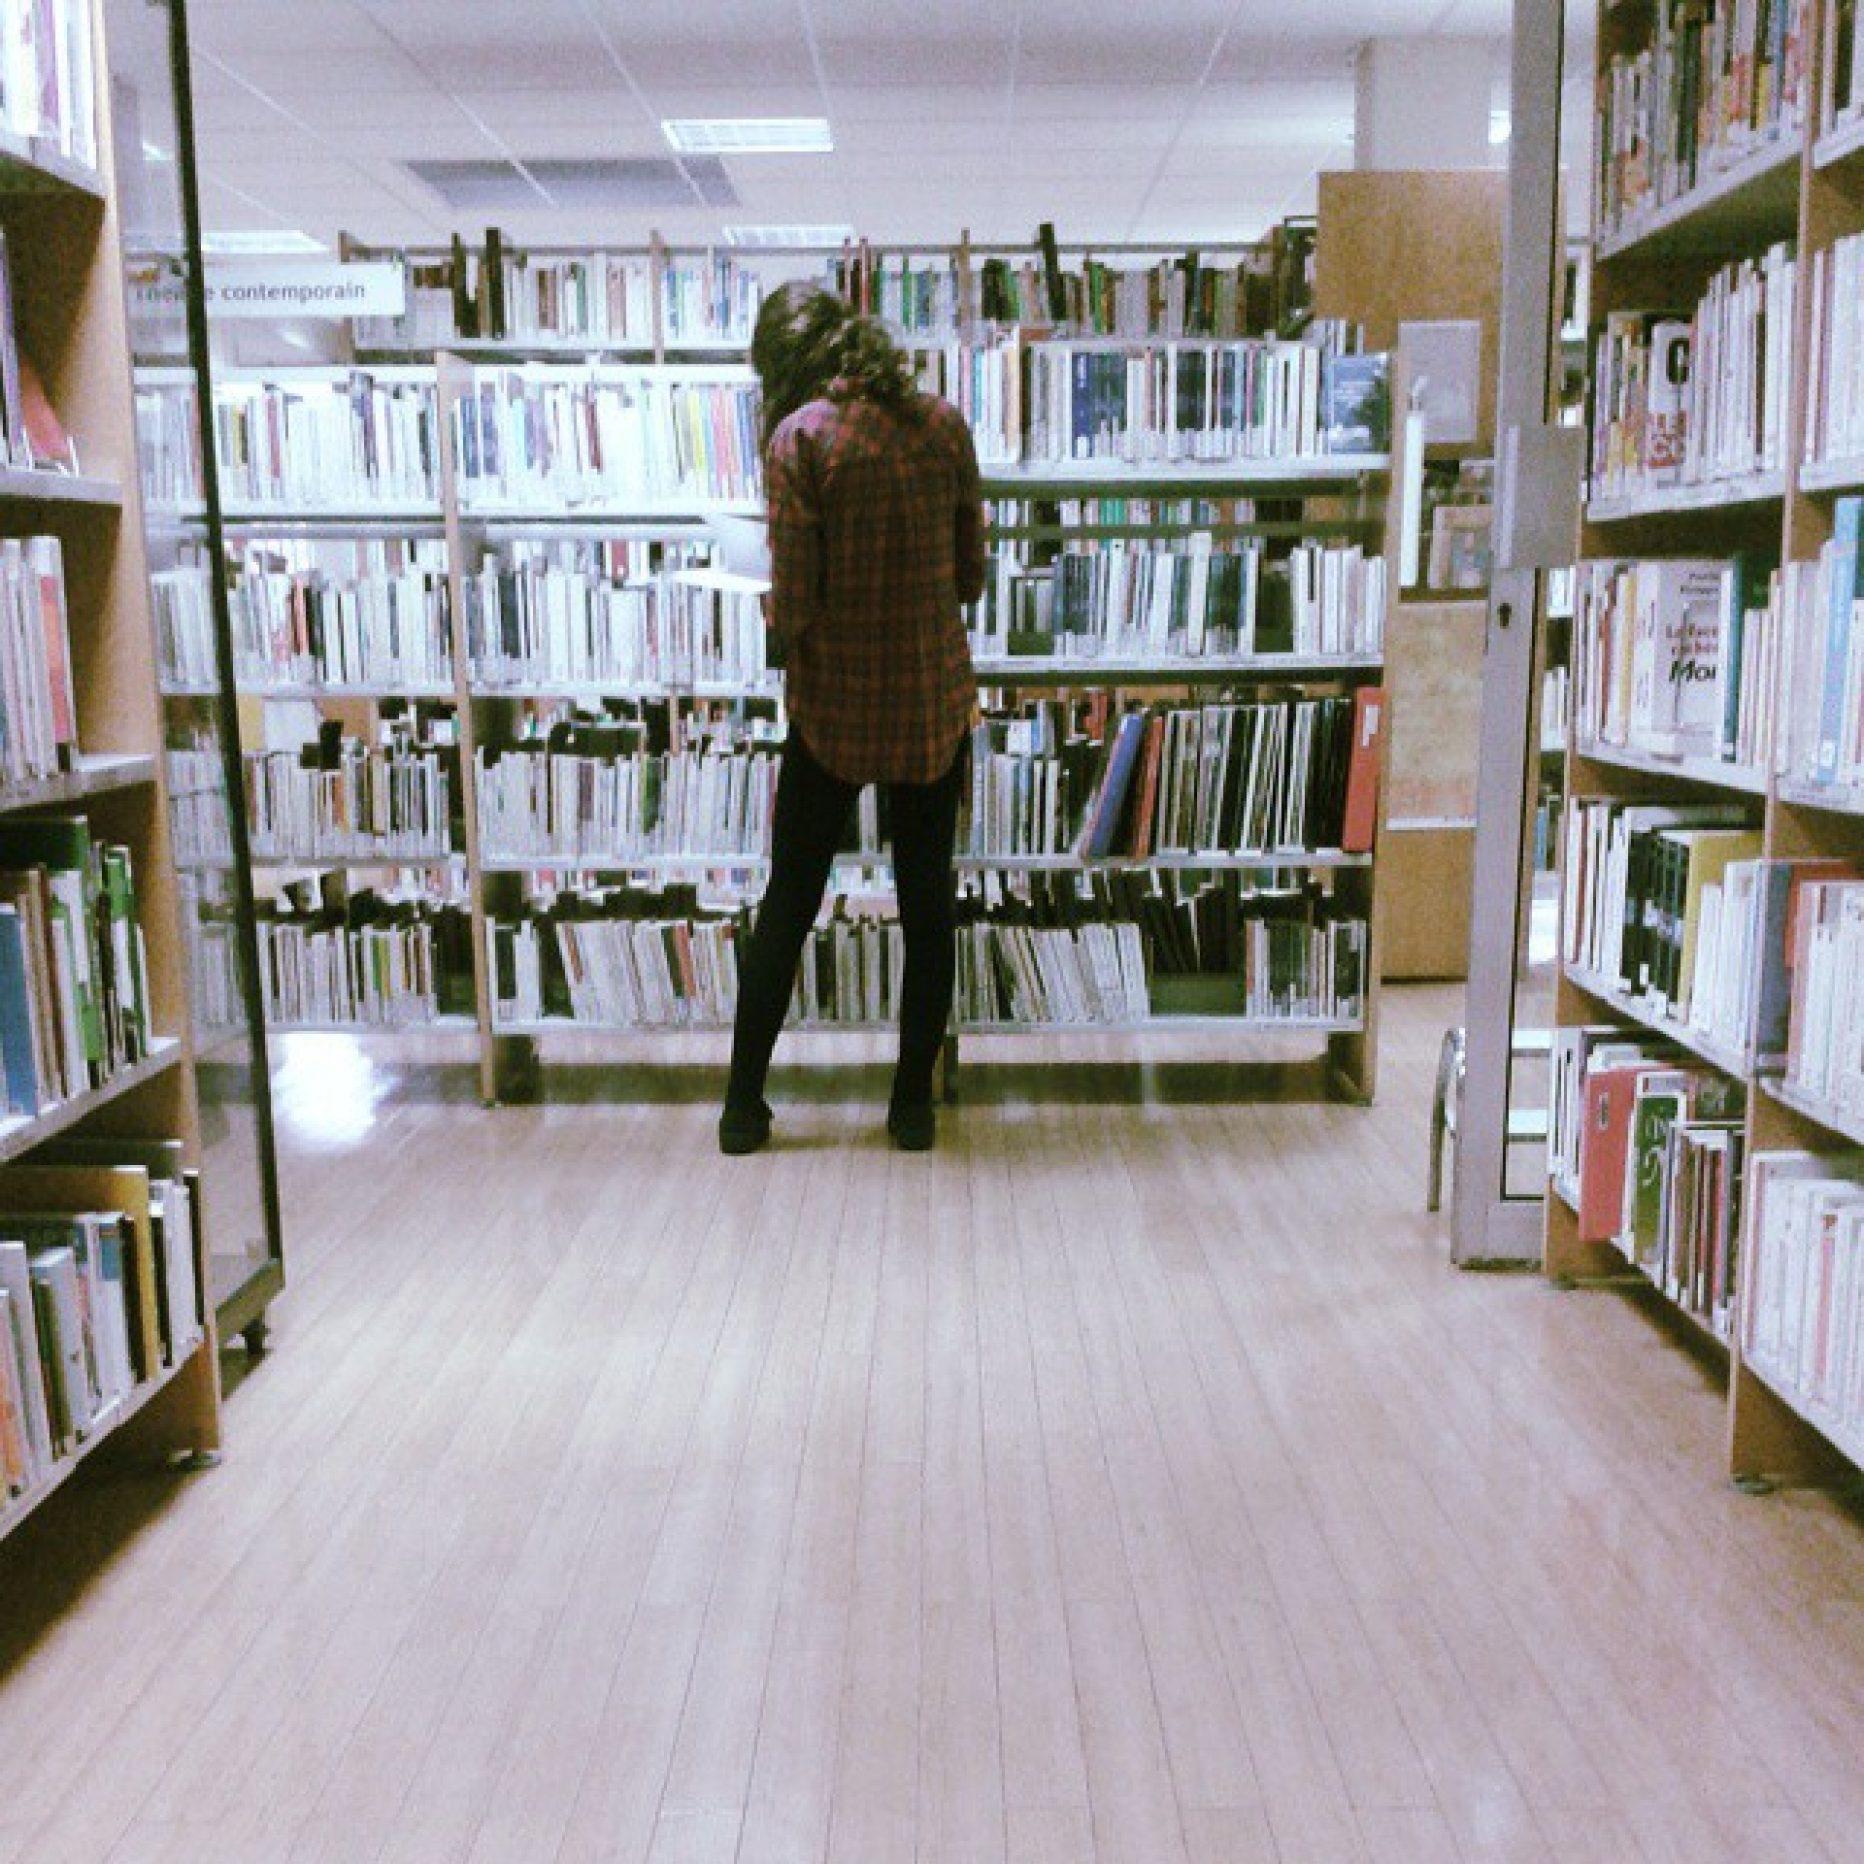 Bibliothèque Oscar Wilde